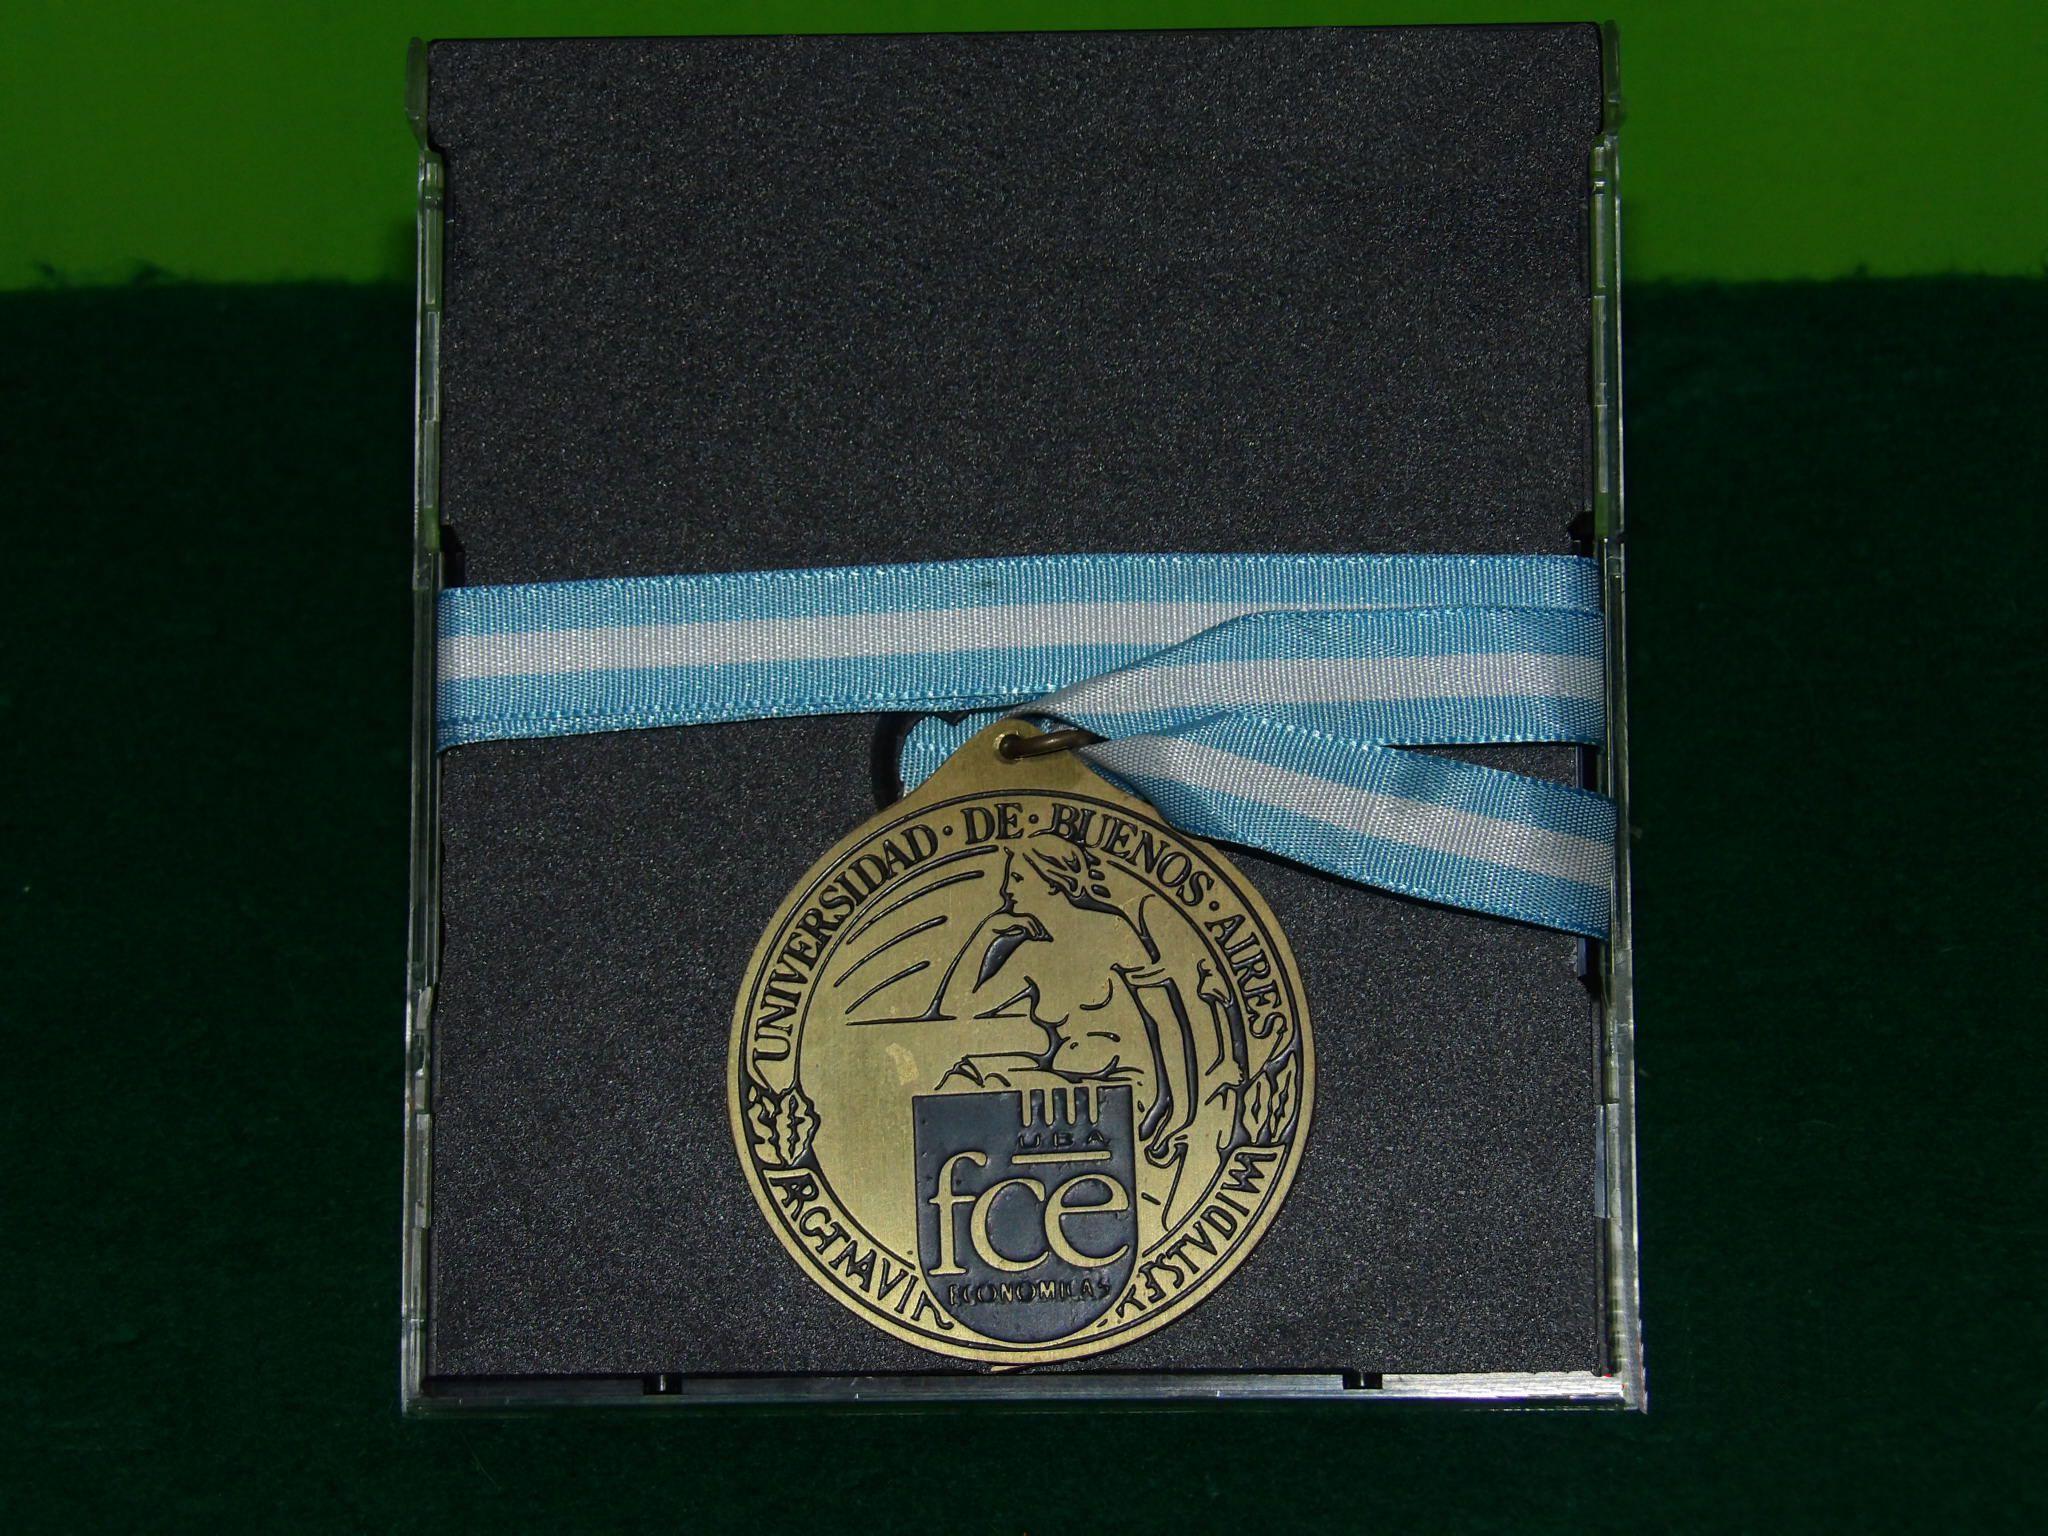 medalla fce uba